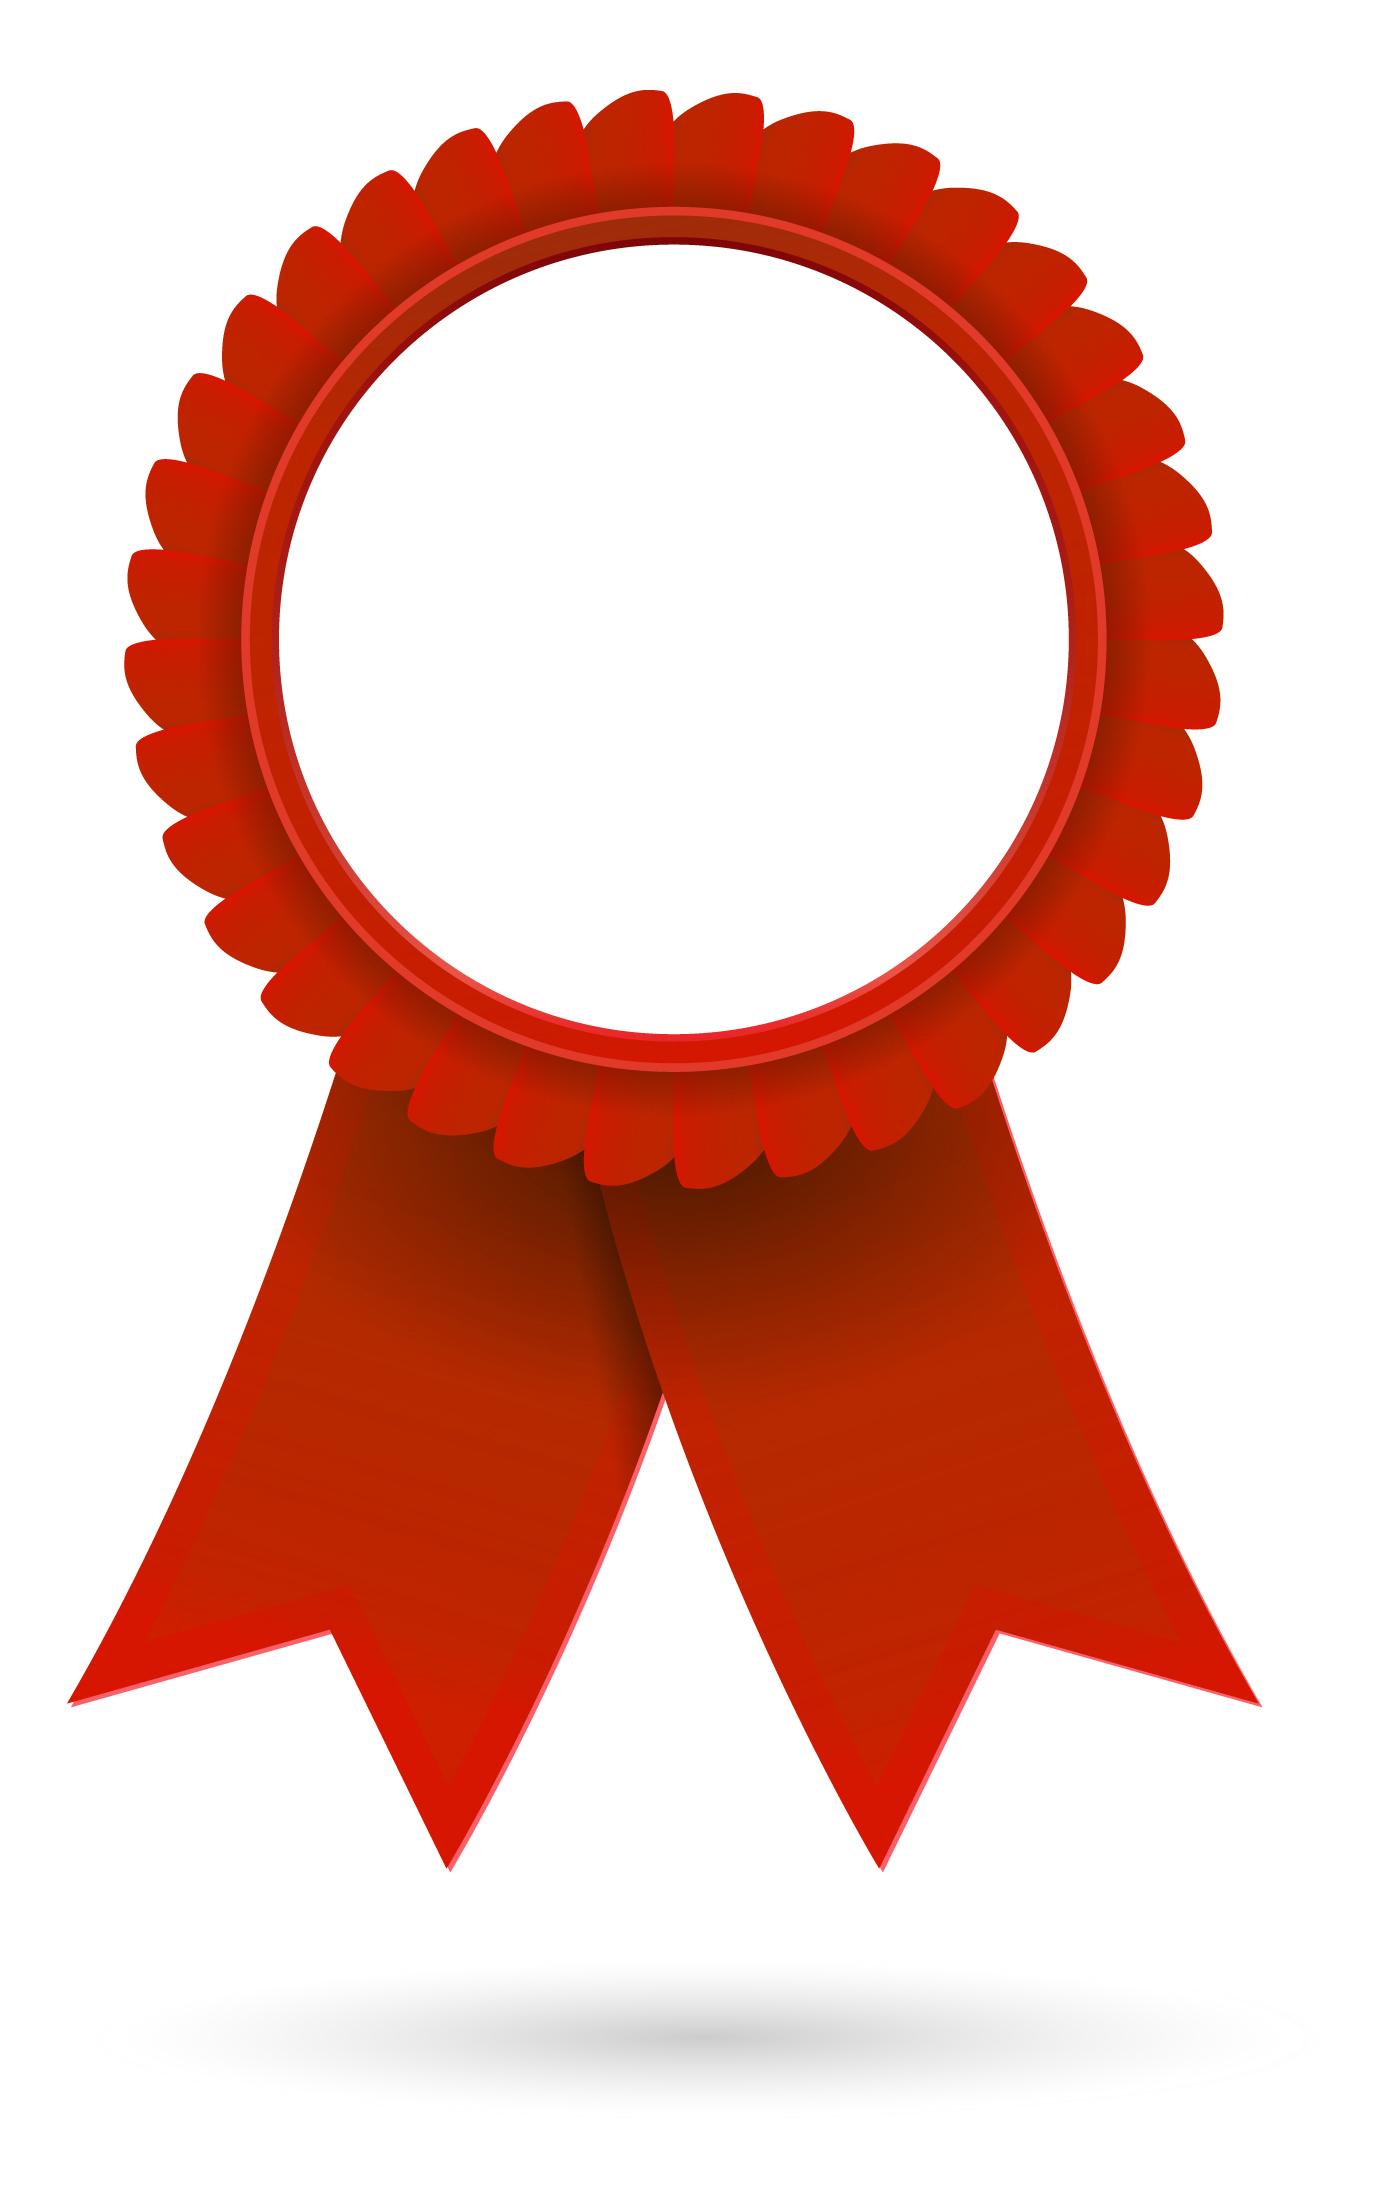 Free Participation Award Cliparts, Download Free Clip Art ...